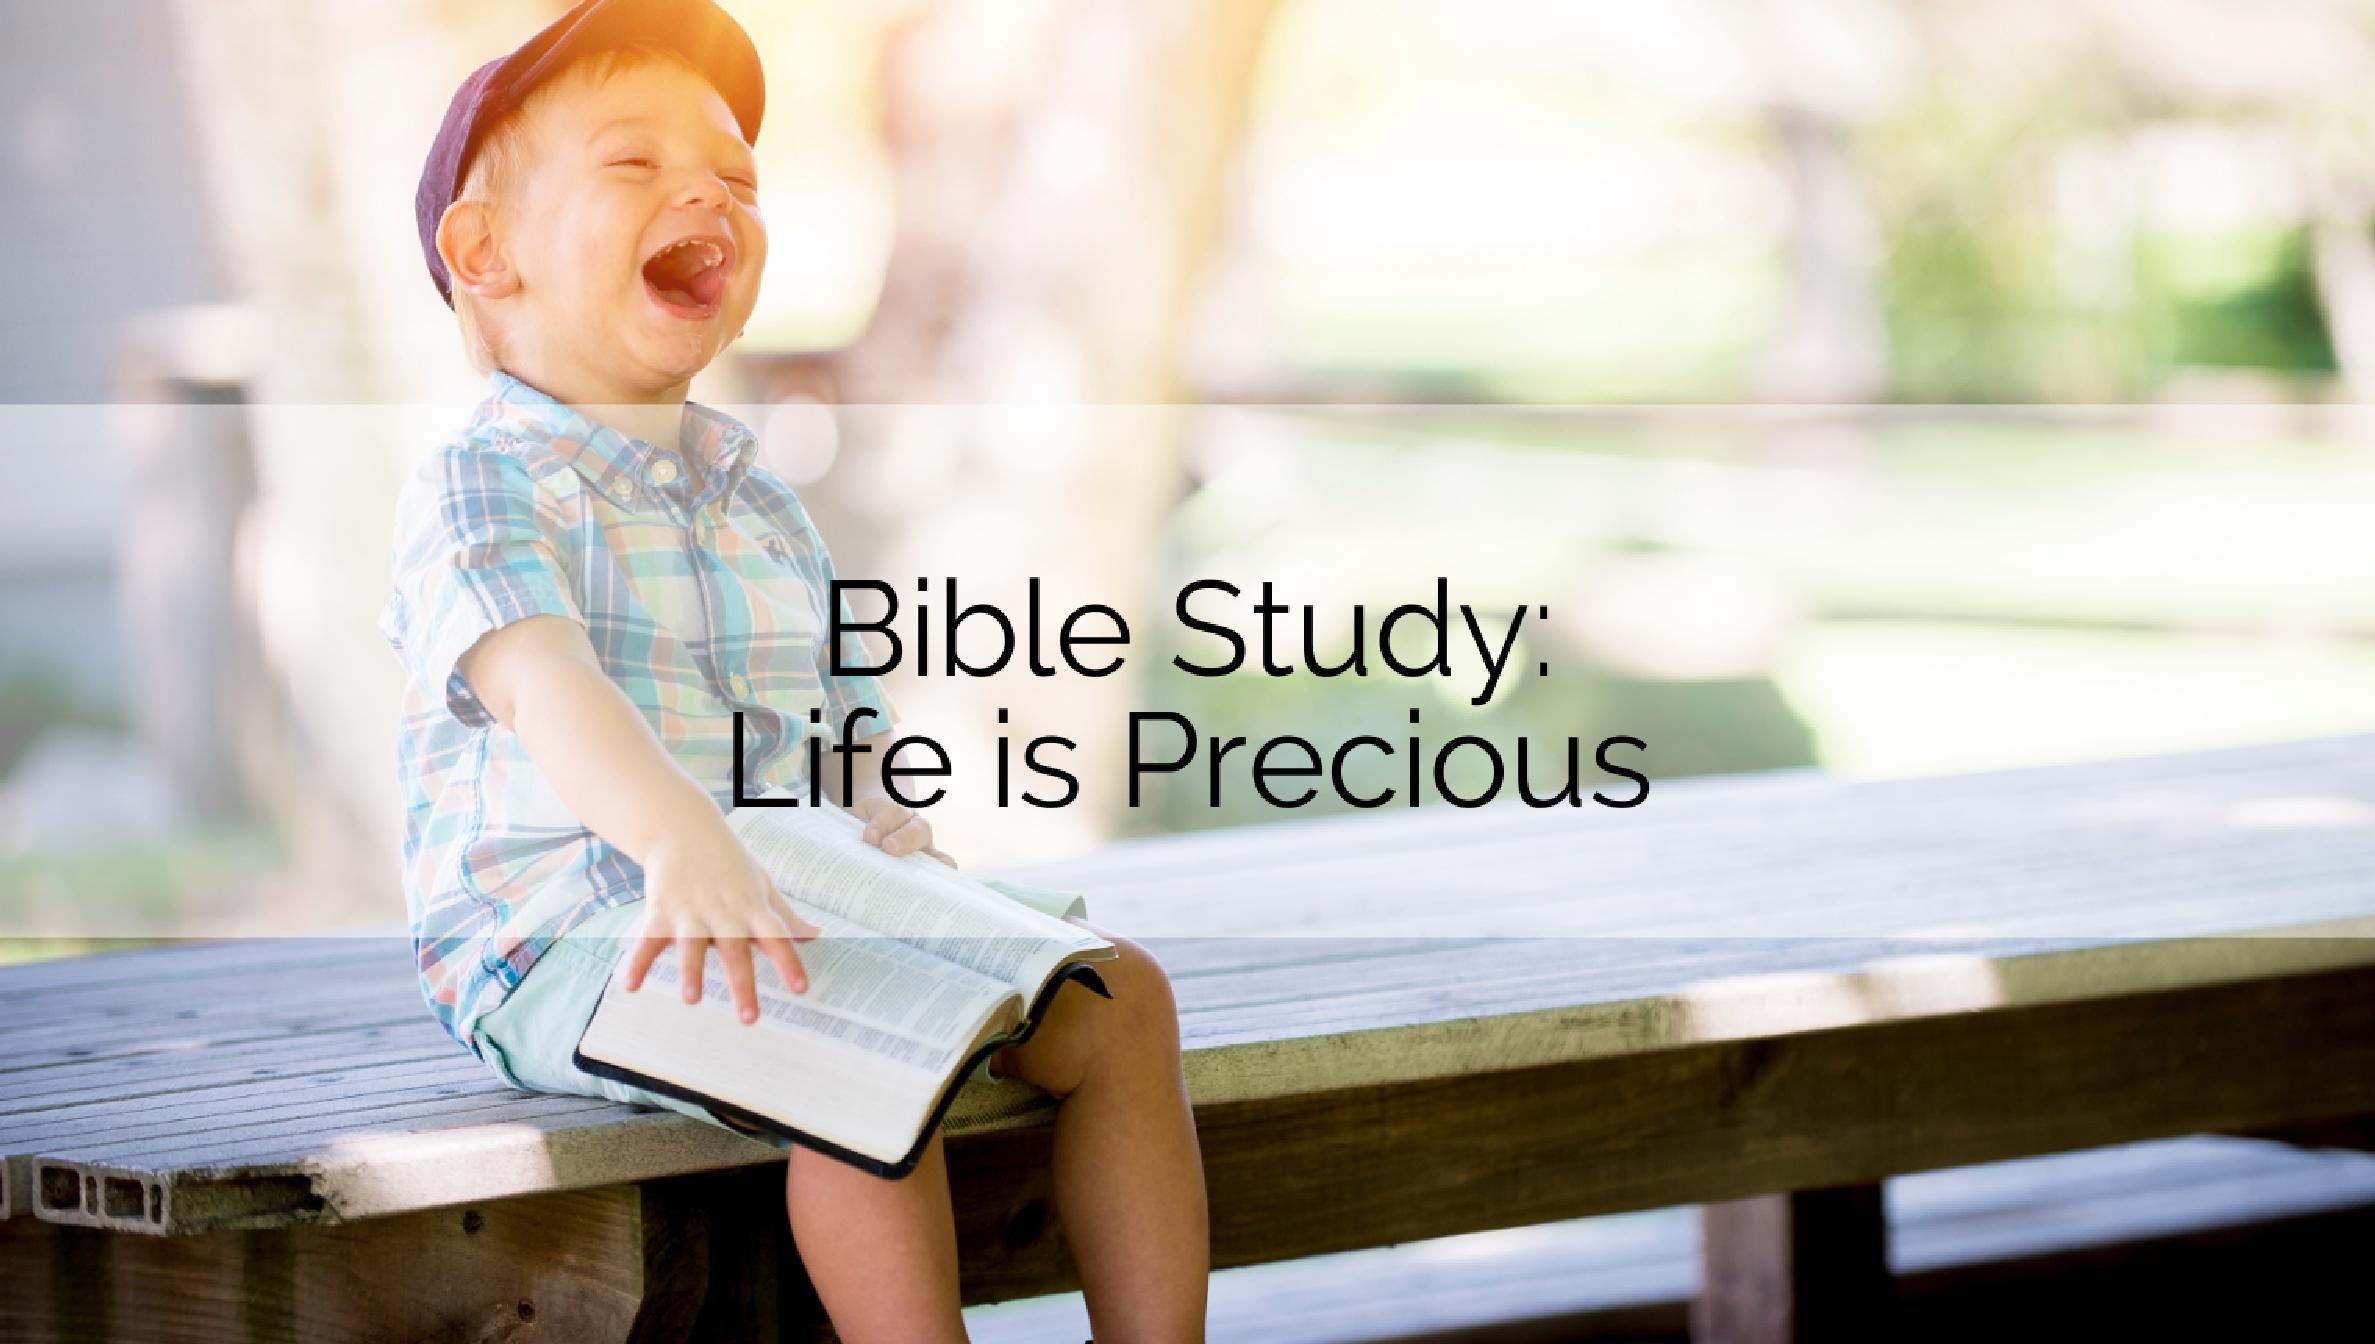 Bible Study: Life is Precious